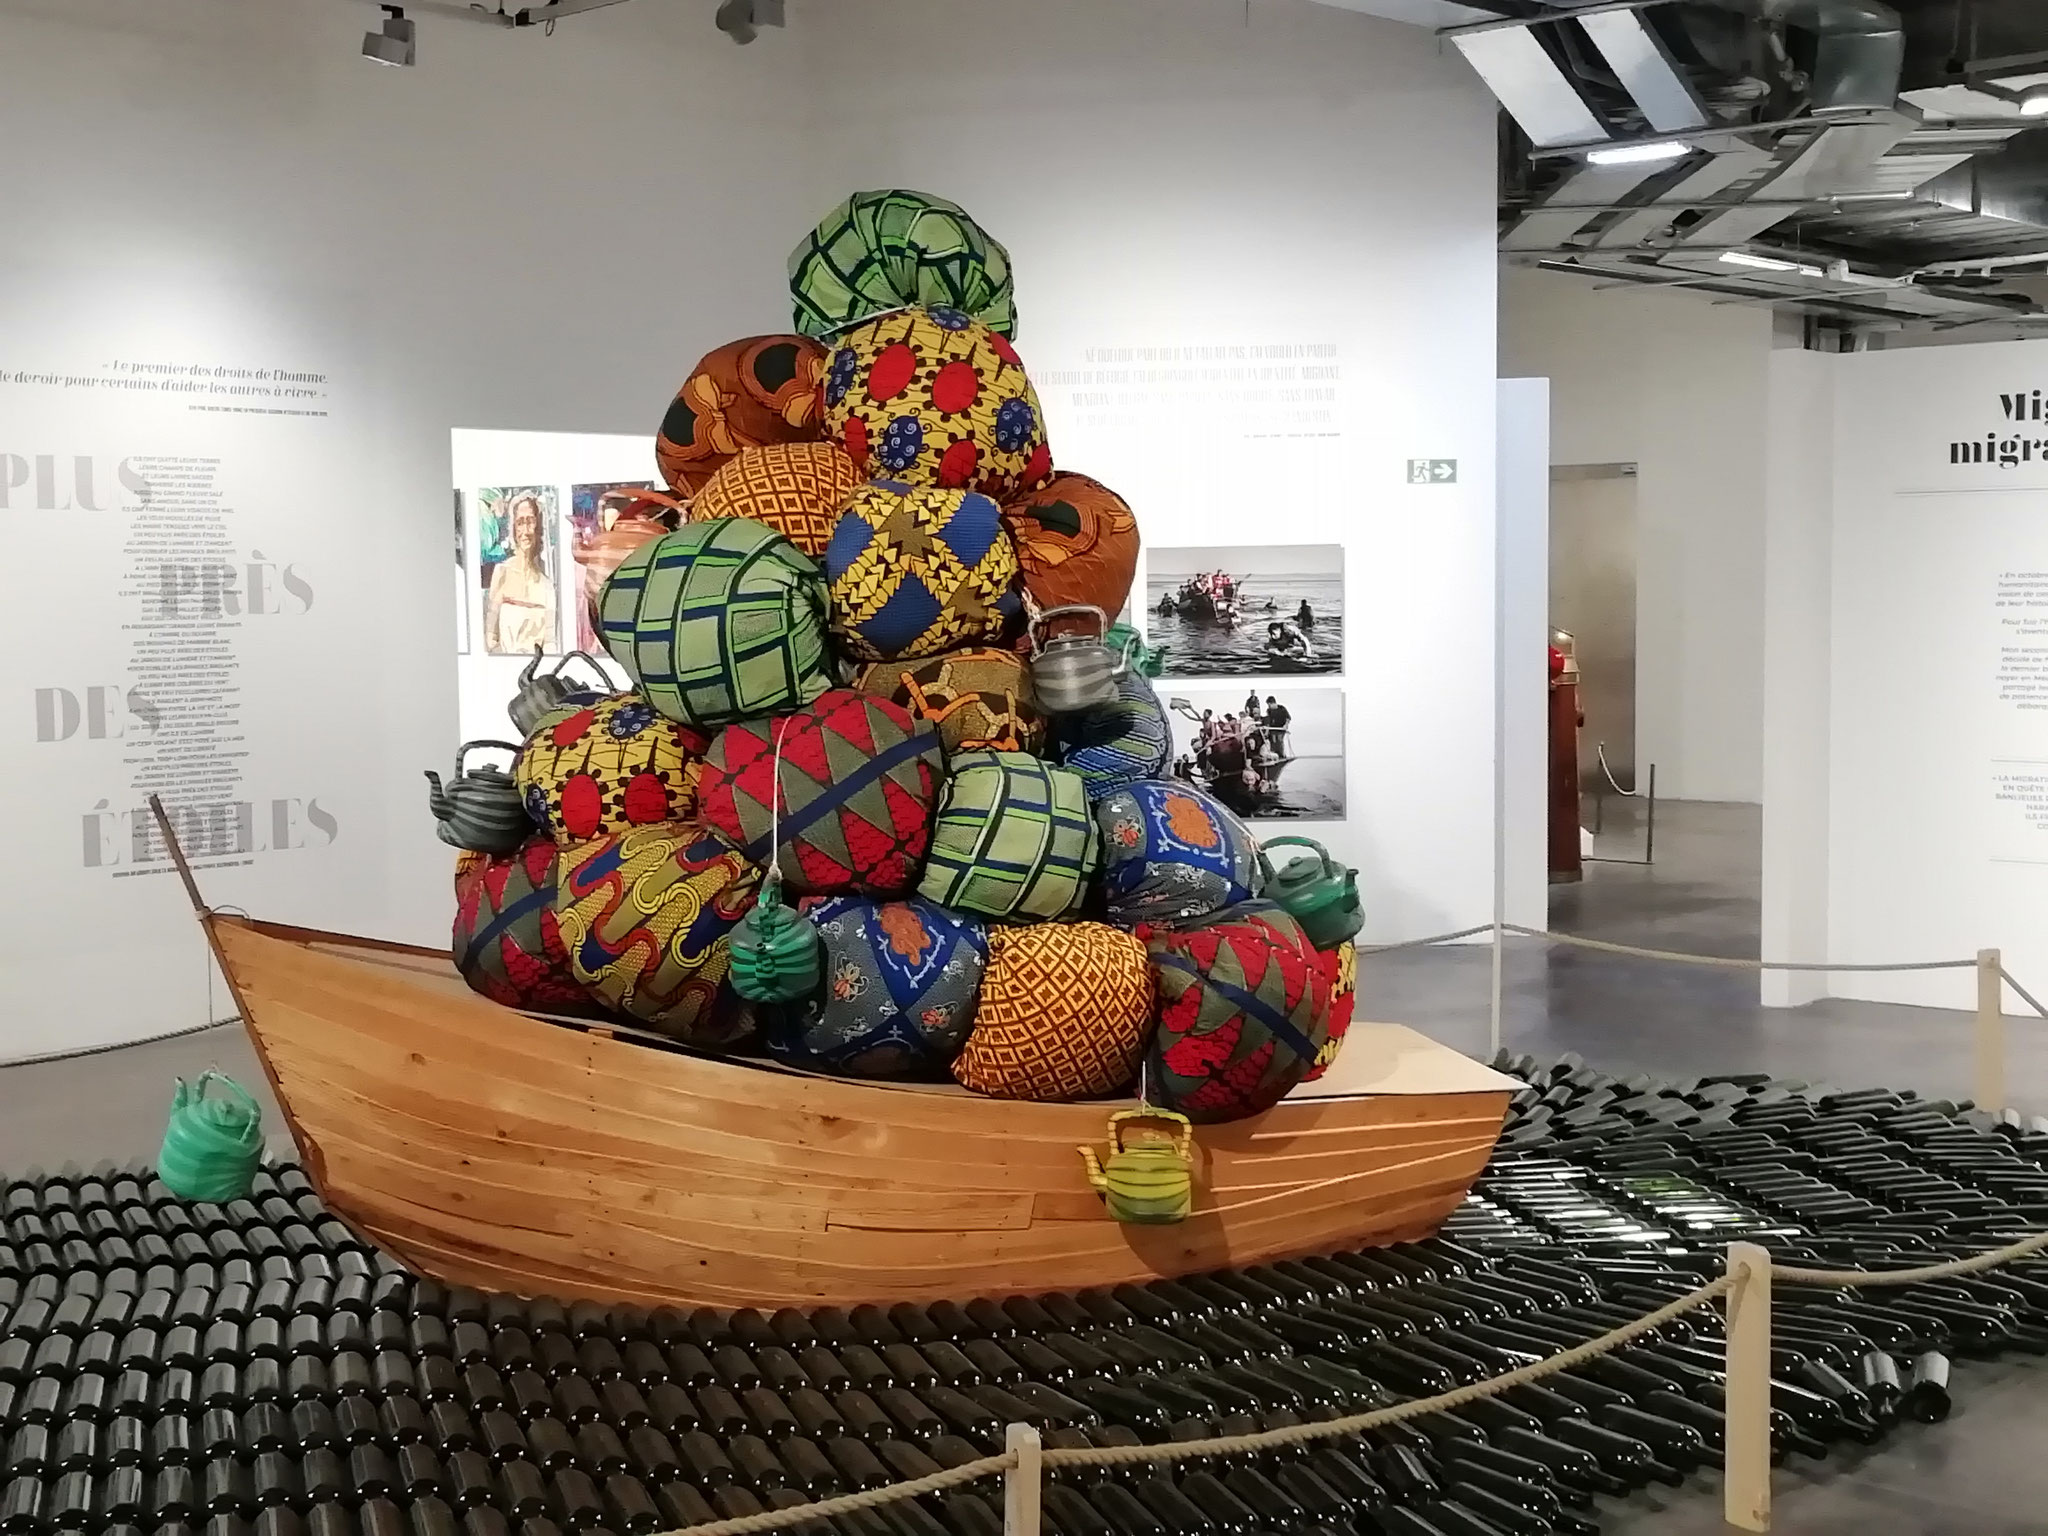 La barque bien chargée, symbole des migrations maritimes